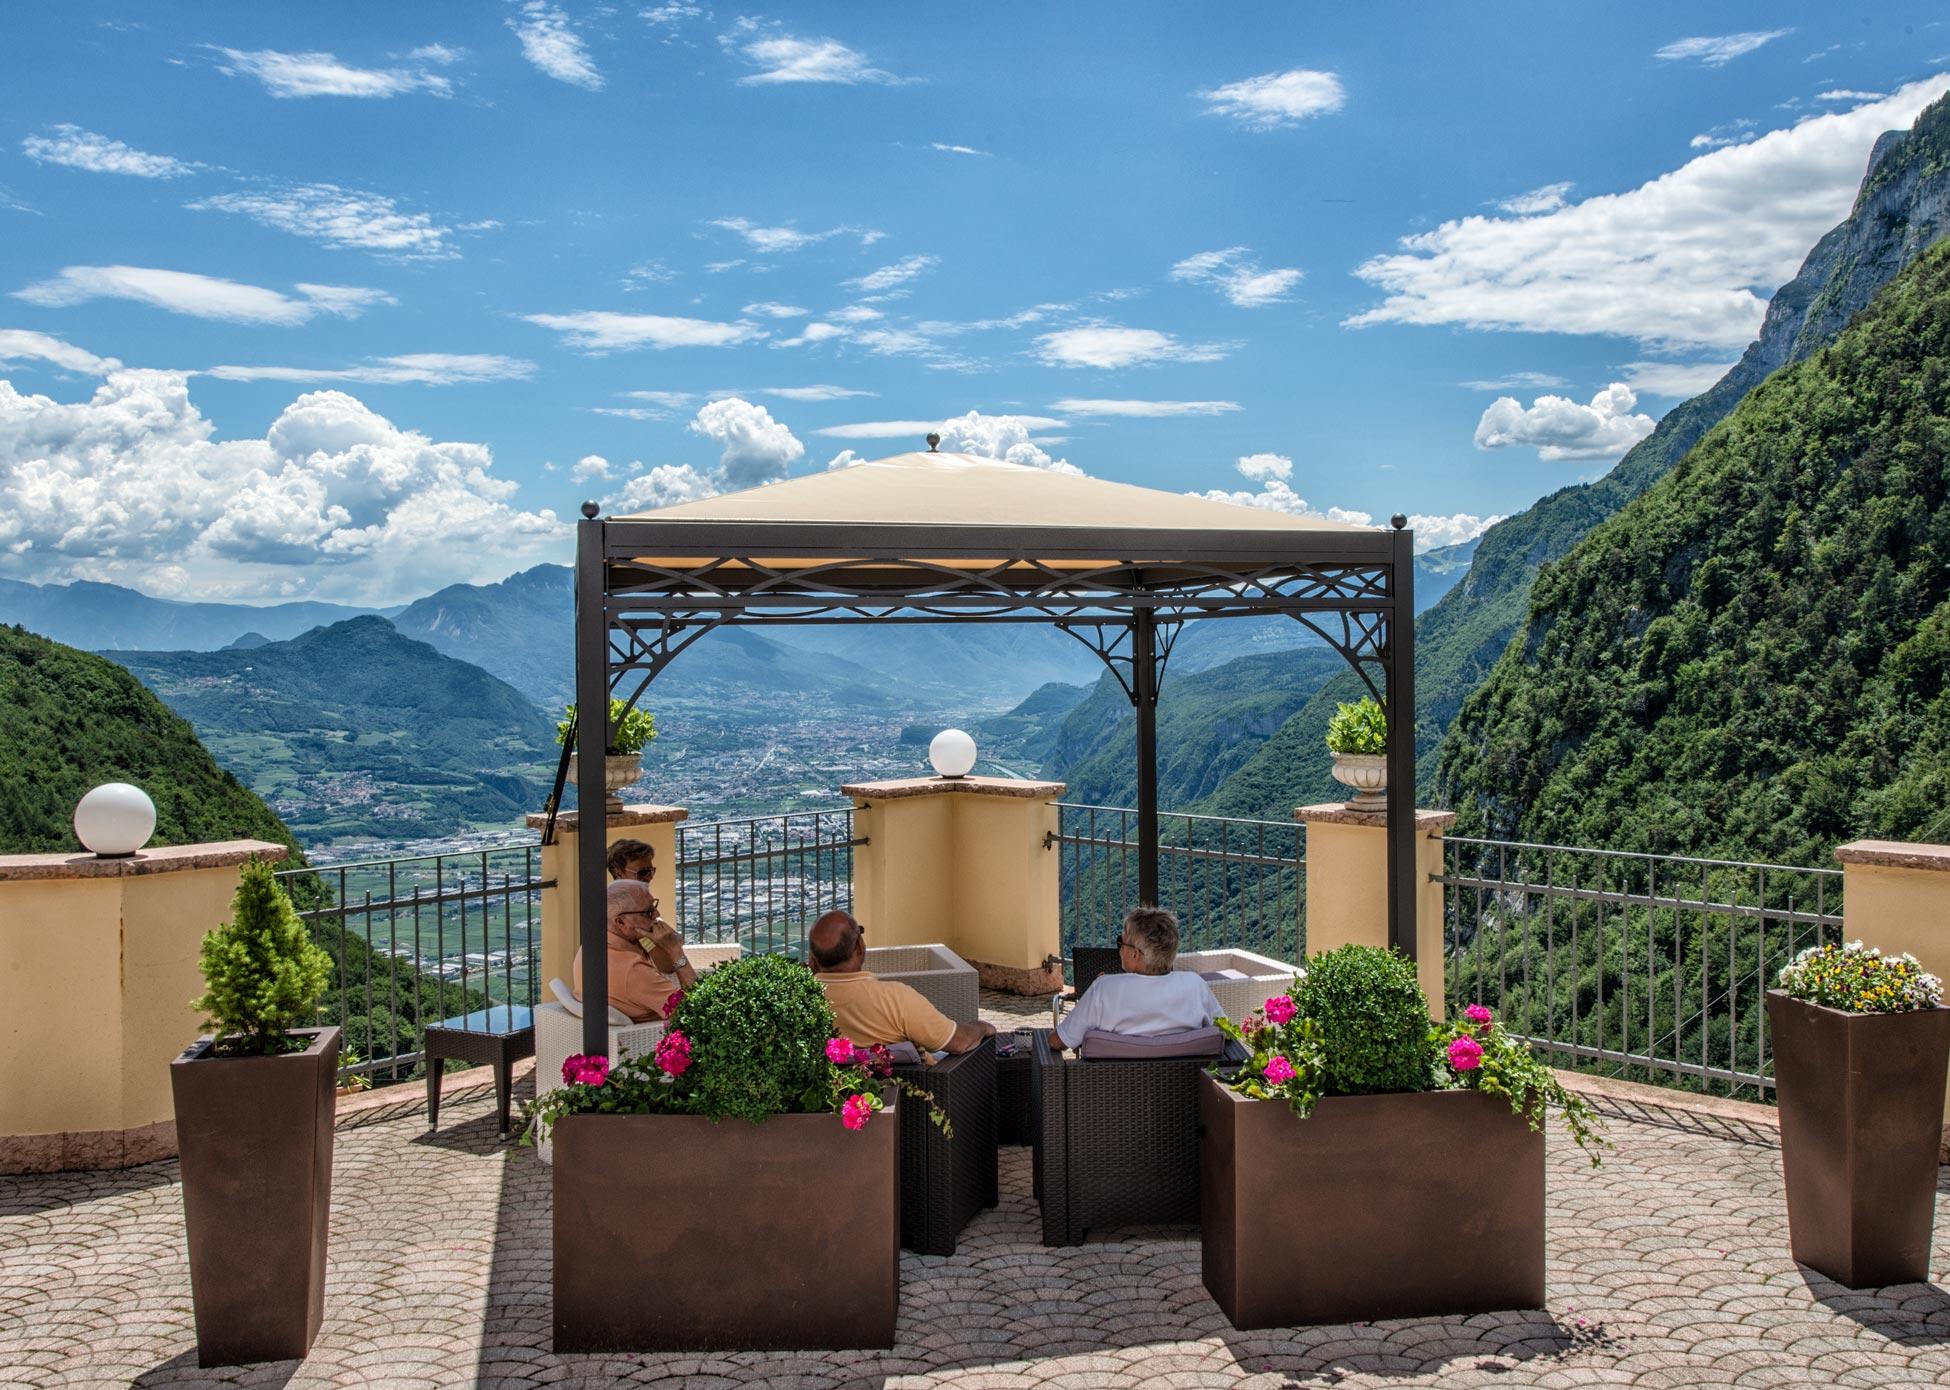 Hotel_miravalle_Albergo02